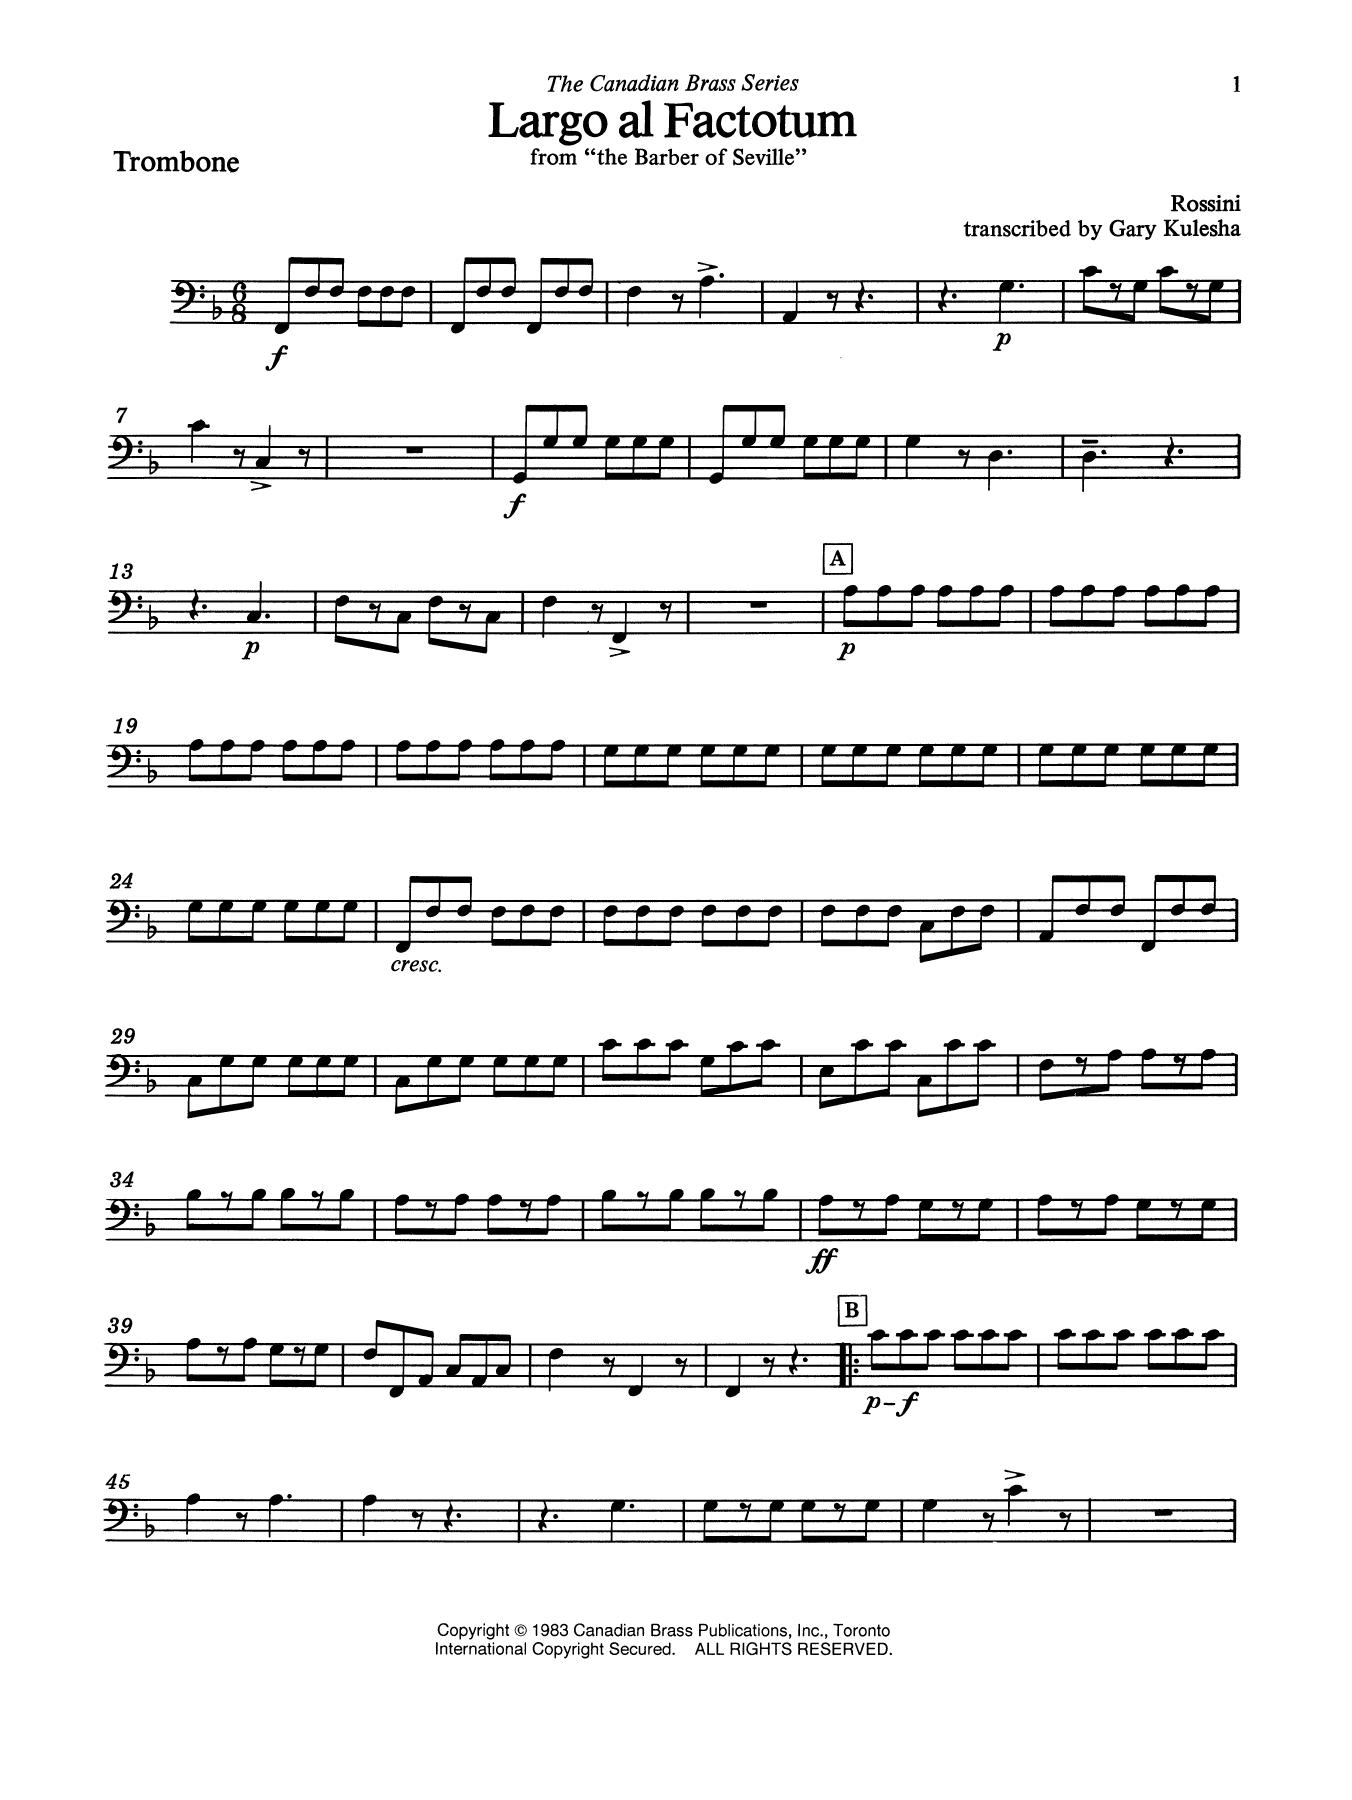 Largo al factotum from The Barber of Seville - Trombone (B.C.) Partituras Digitales